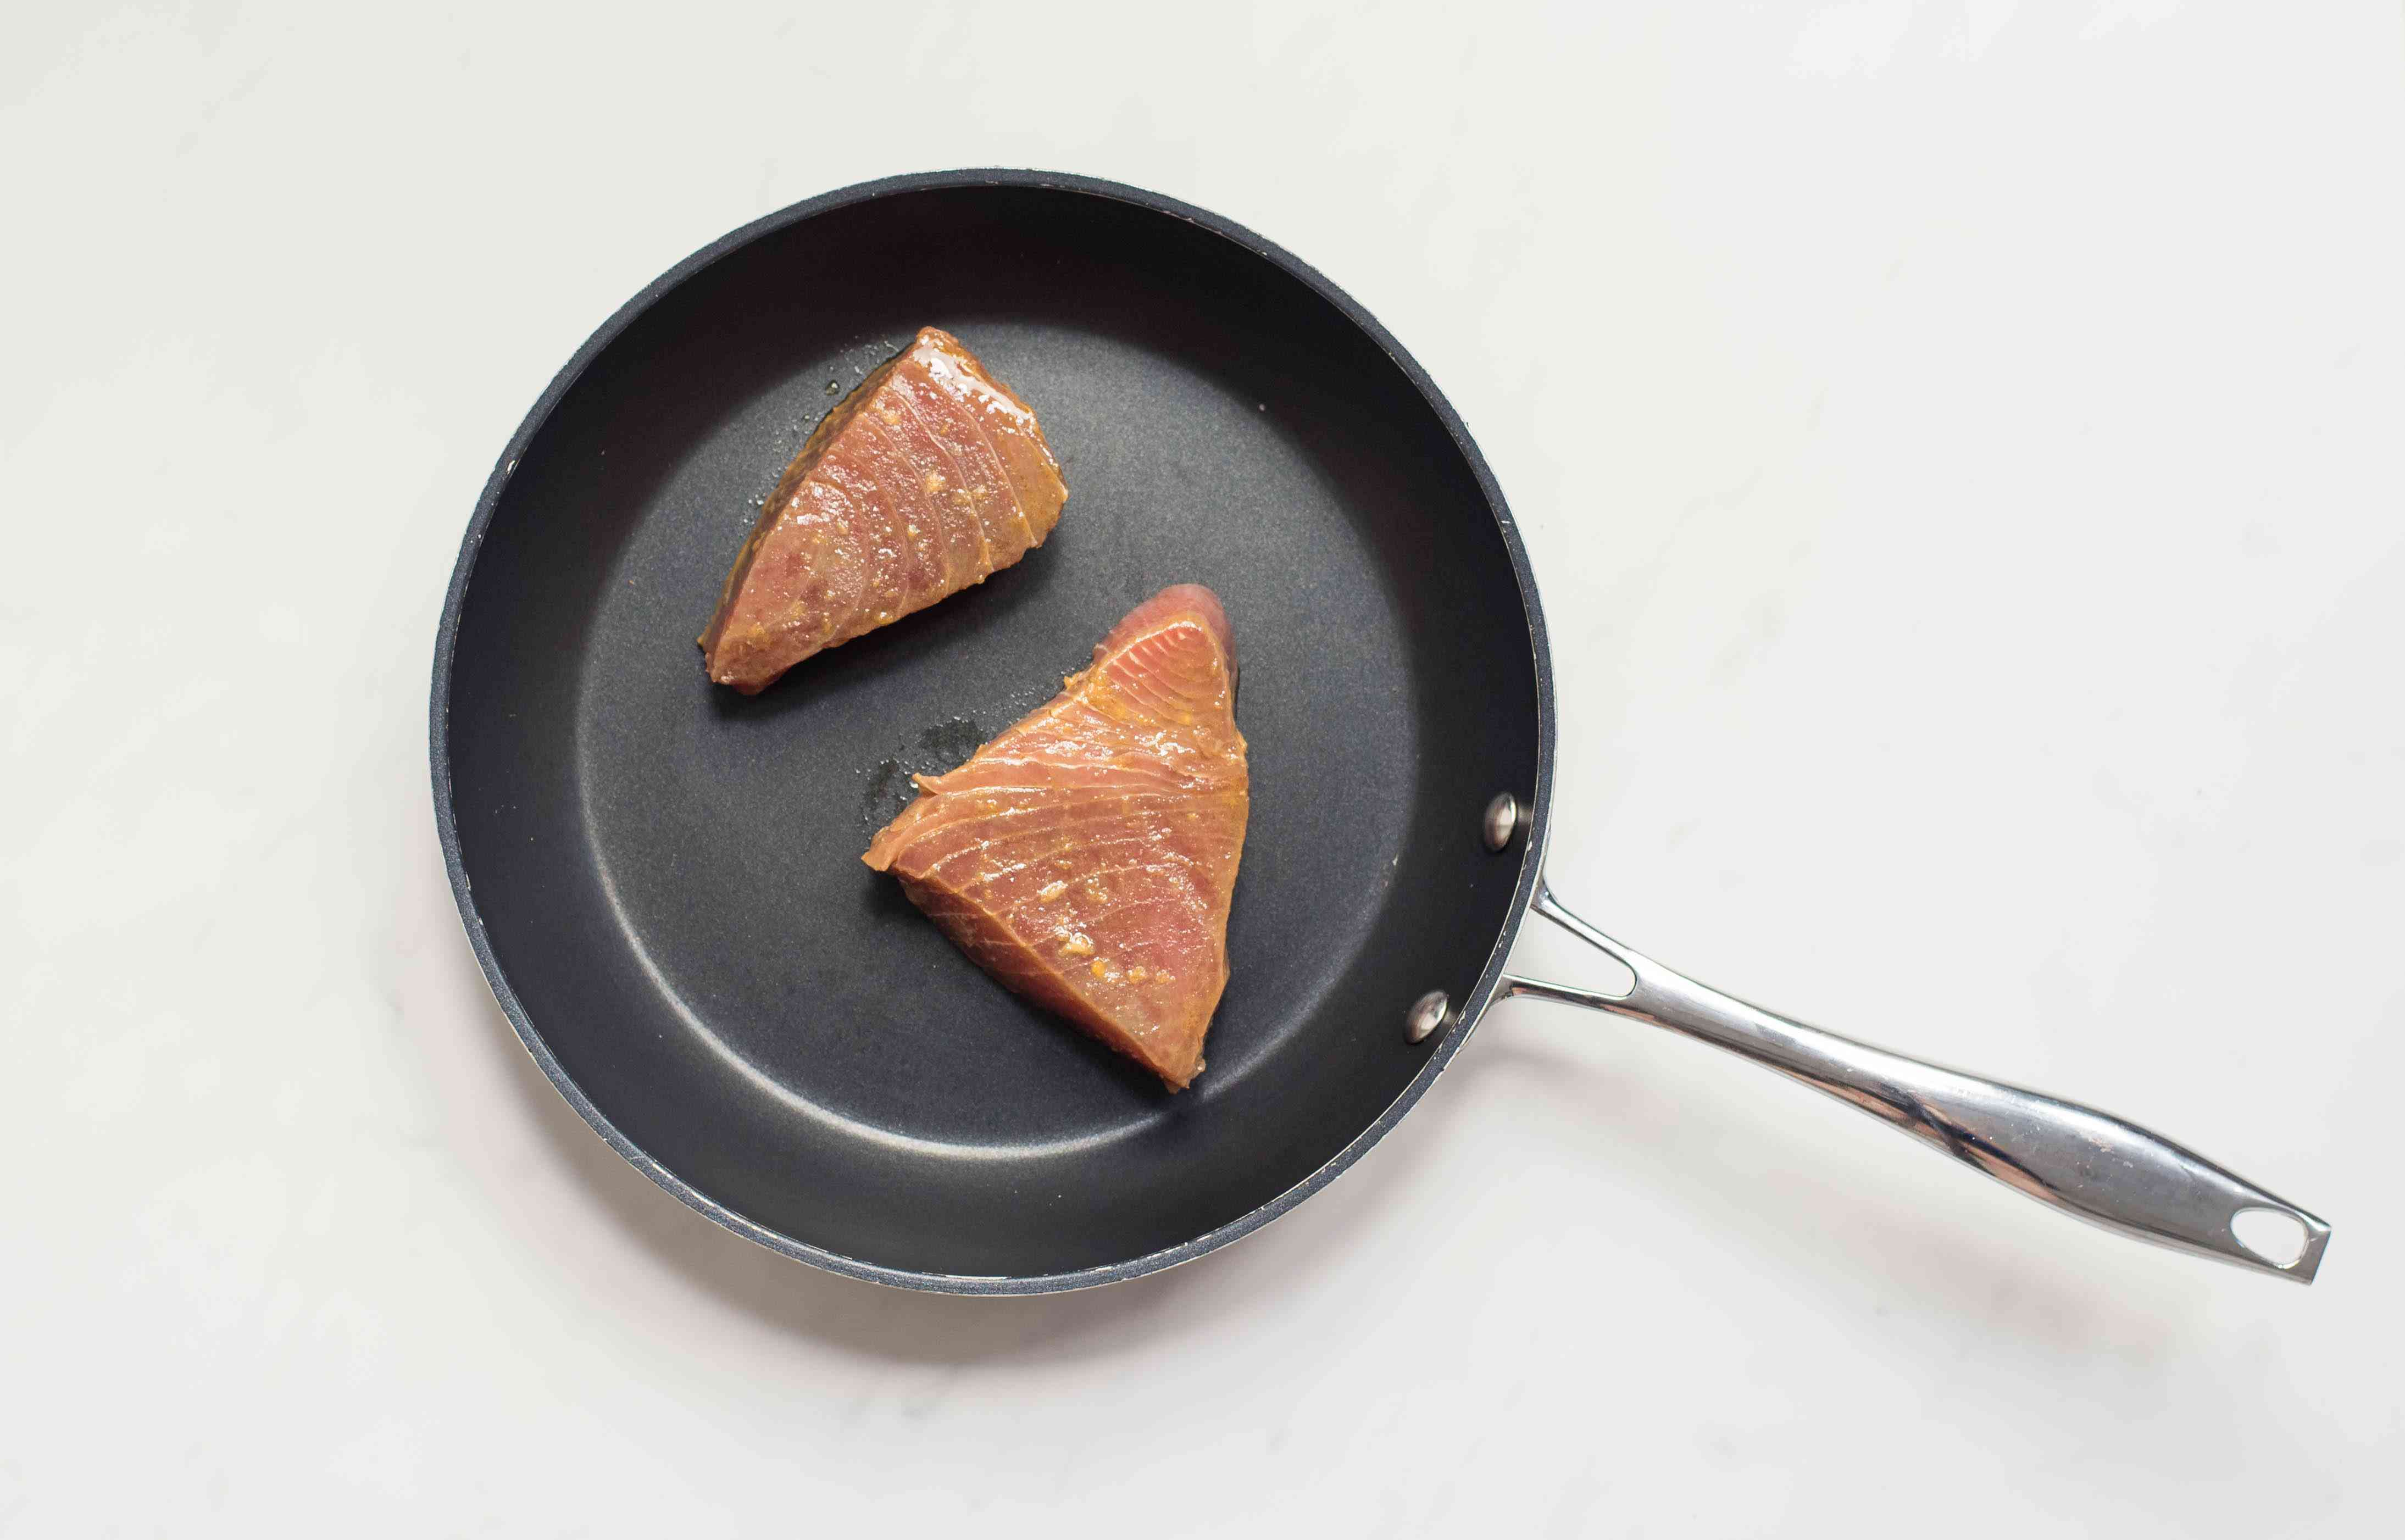 Put in frying pan